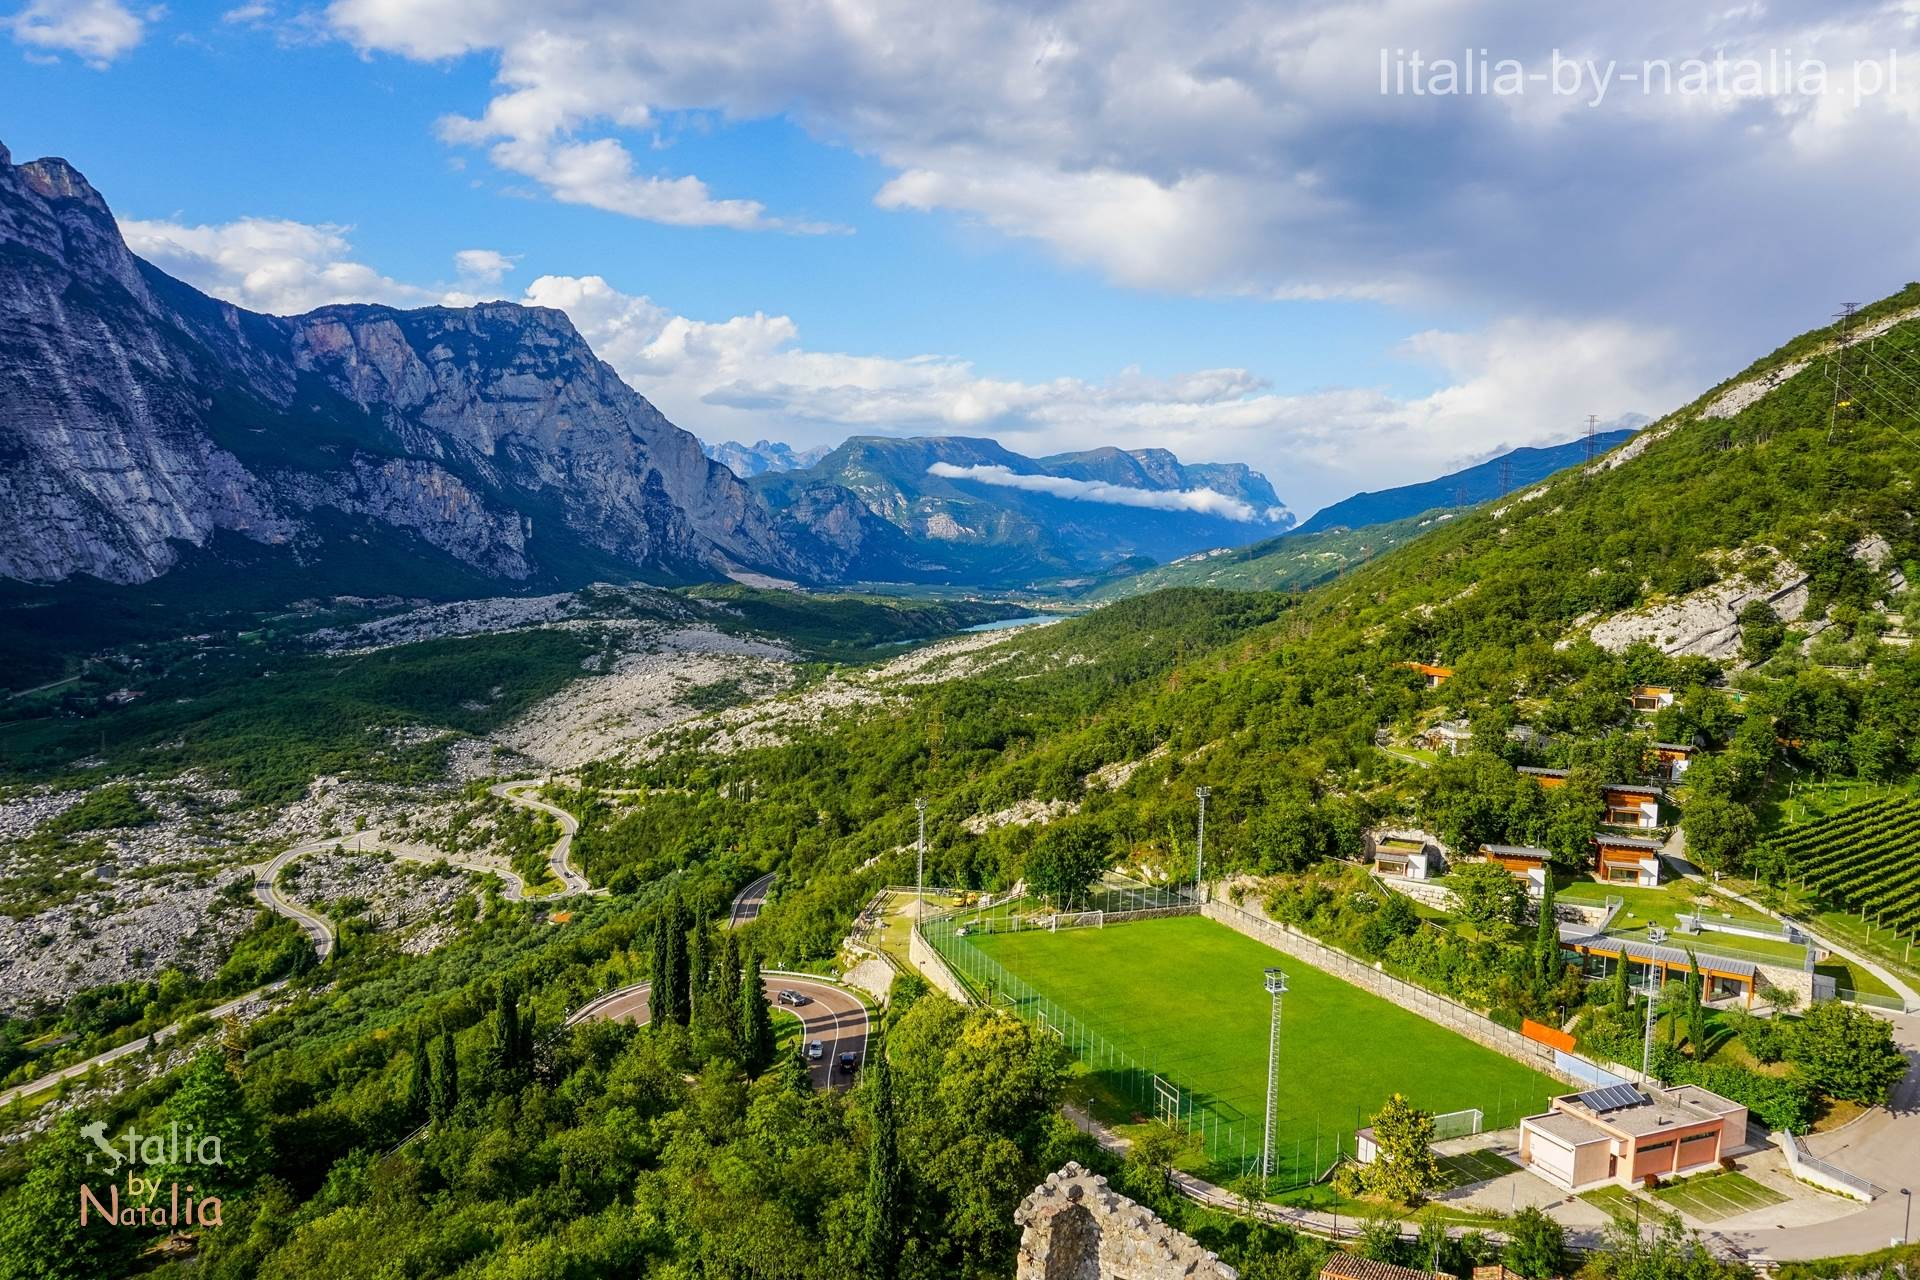 okolice jeziora garda Dolina rzeki Sarca Garda Cavedine Arco Drena Toblino